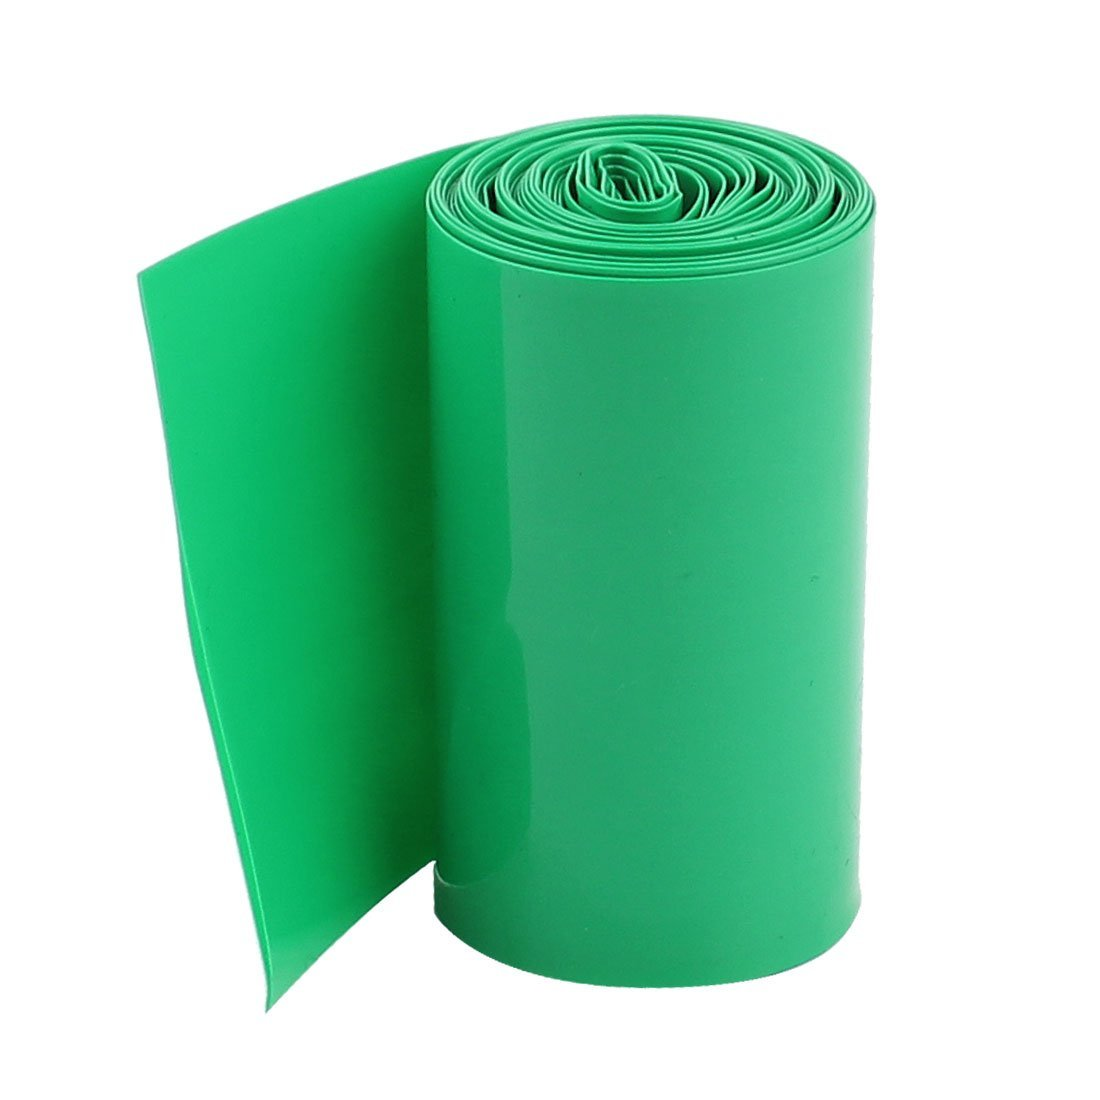 2M 50mm Dark Green PVC Heat Shrink Tubing Wrap for 2 x 18650 Battery